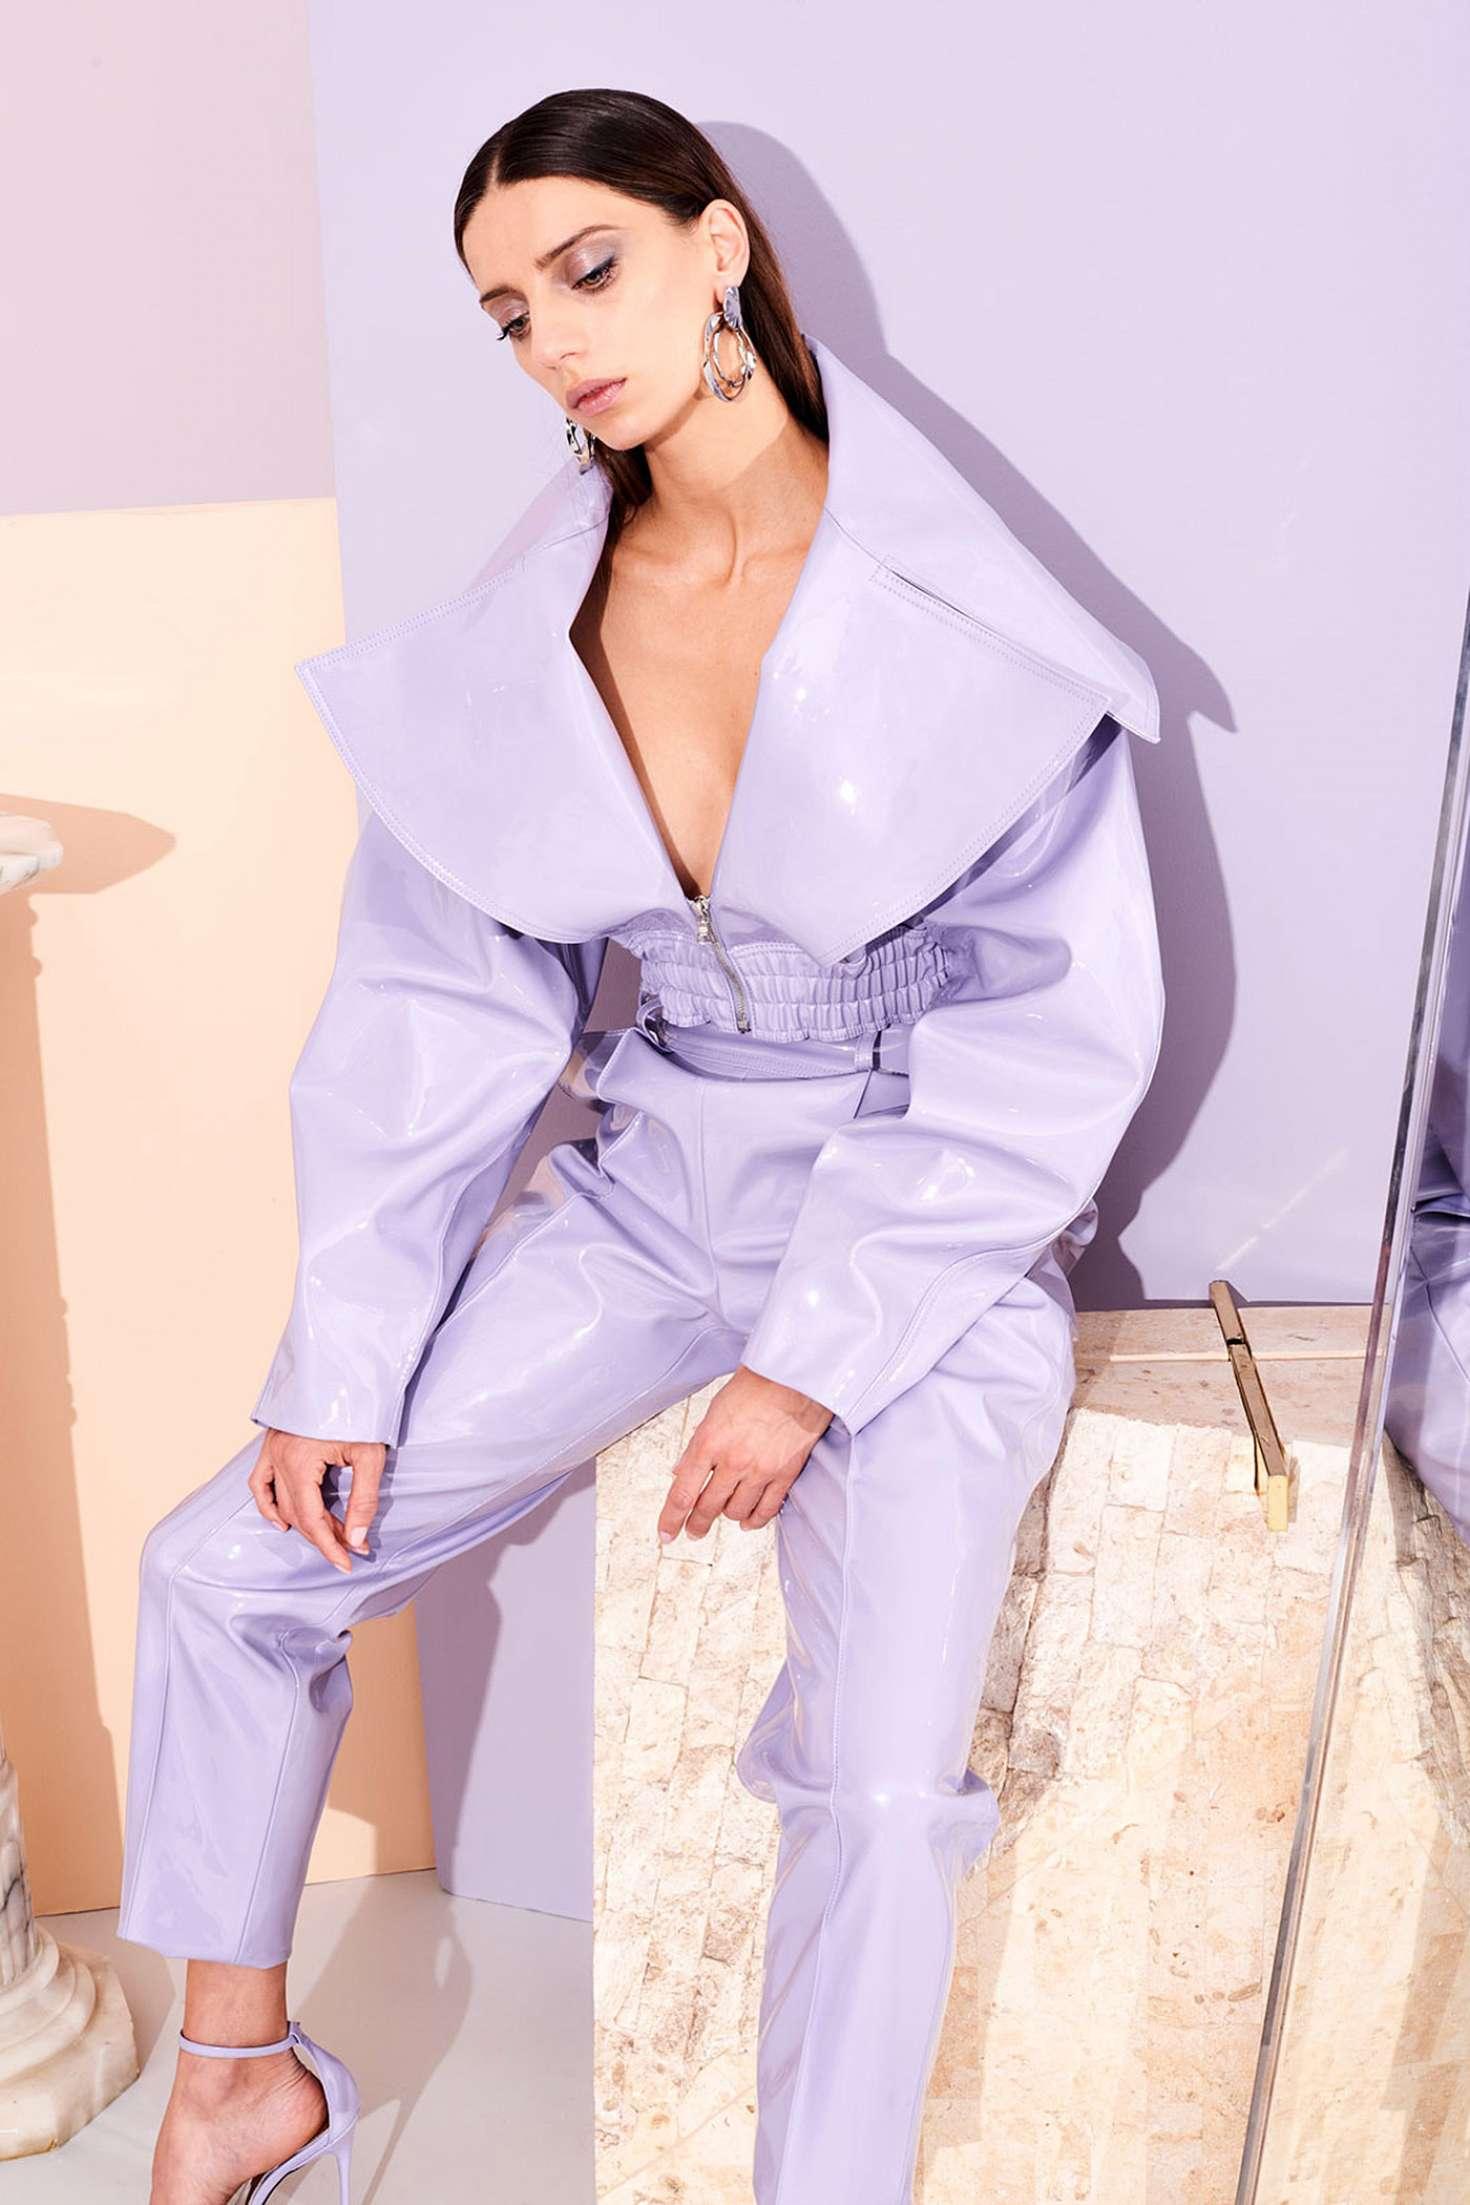 2019 Angela Sarafyan nudes (53 photo), Pussy, Sideboobs, Selfie, cameltoe 2020